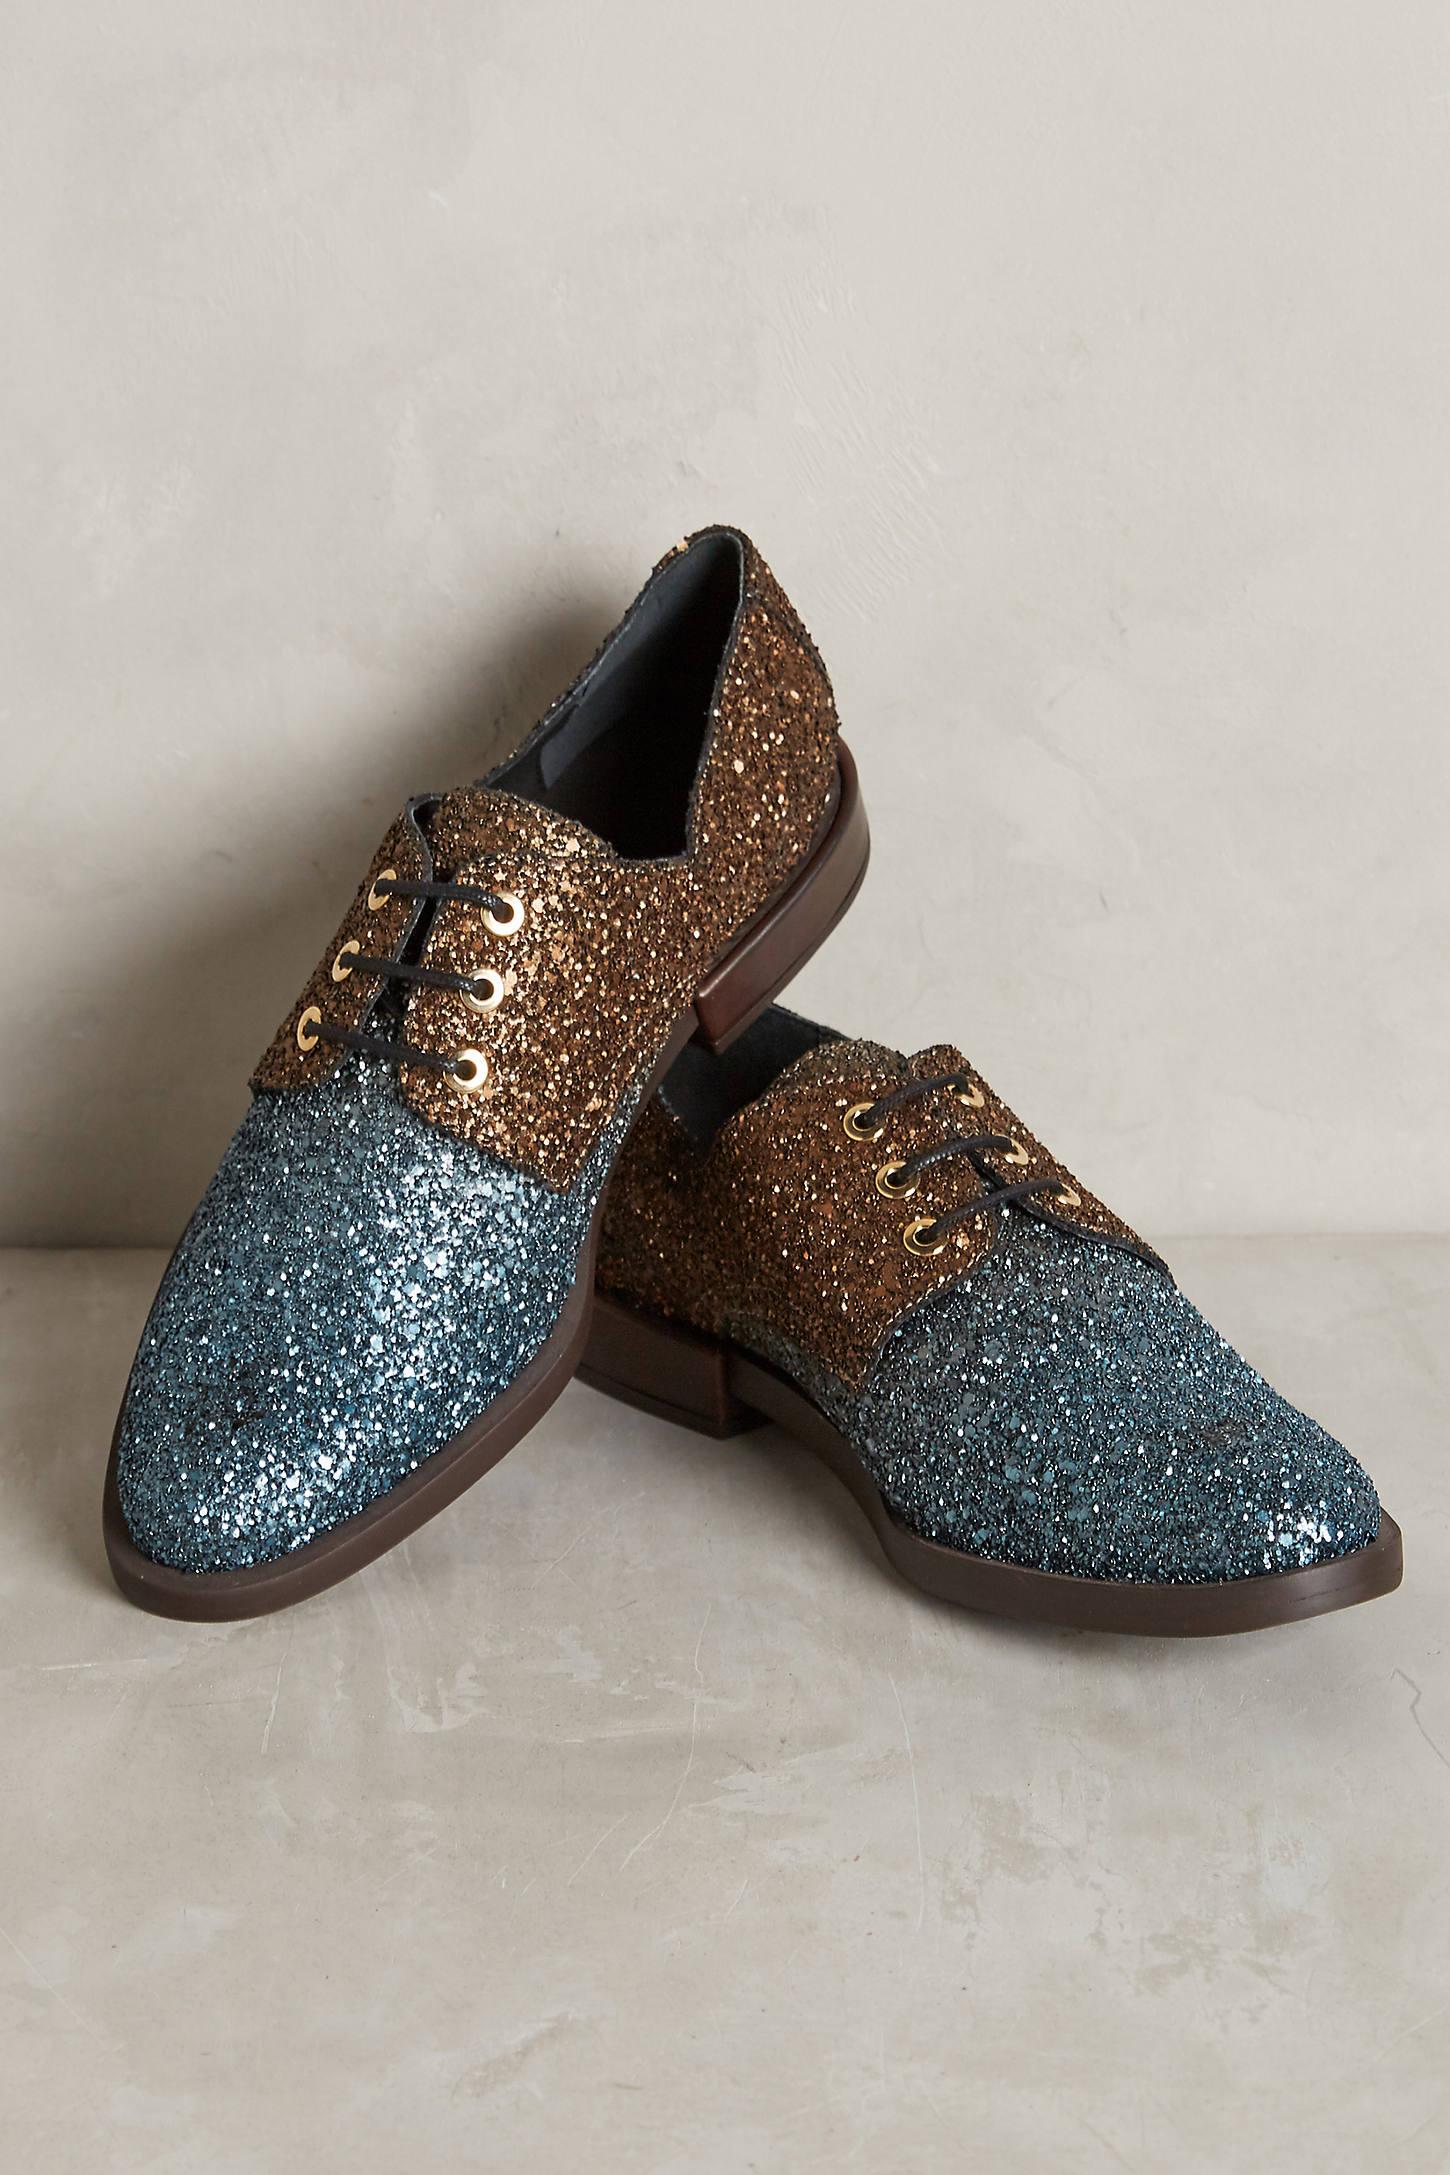 Miista Adelaide Glitter Oxfords